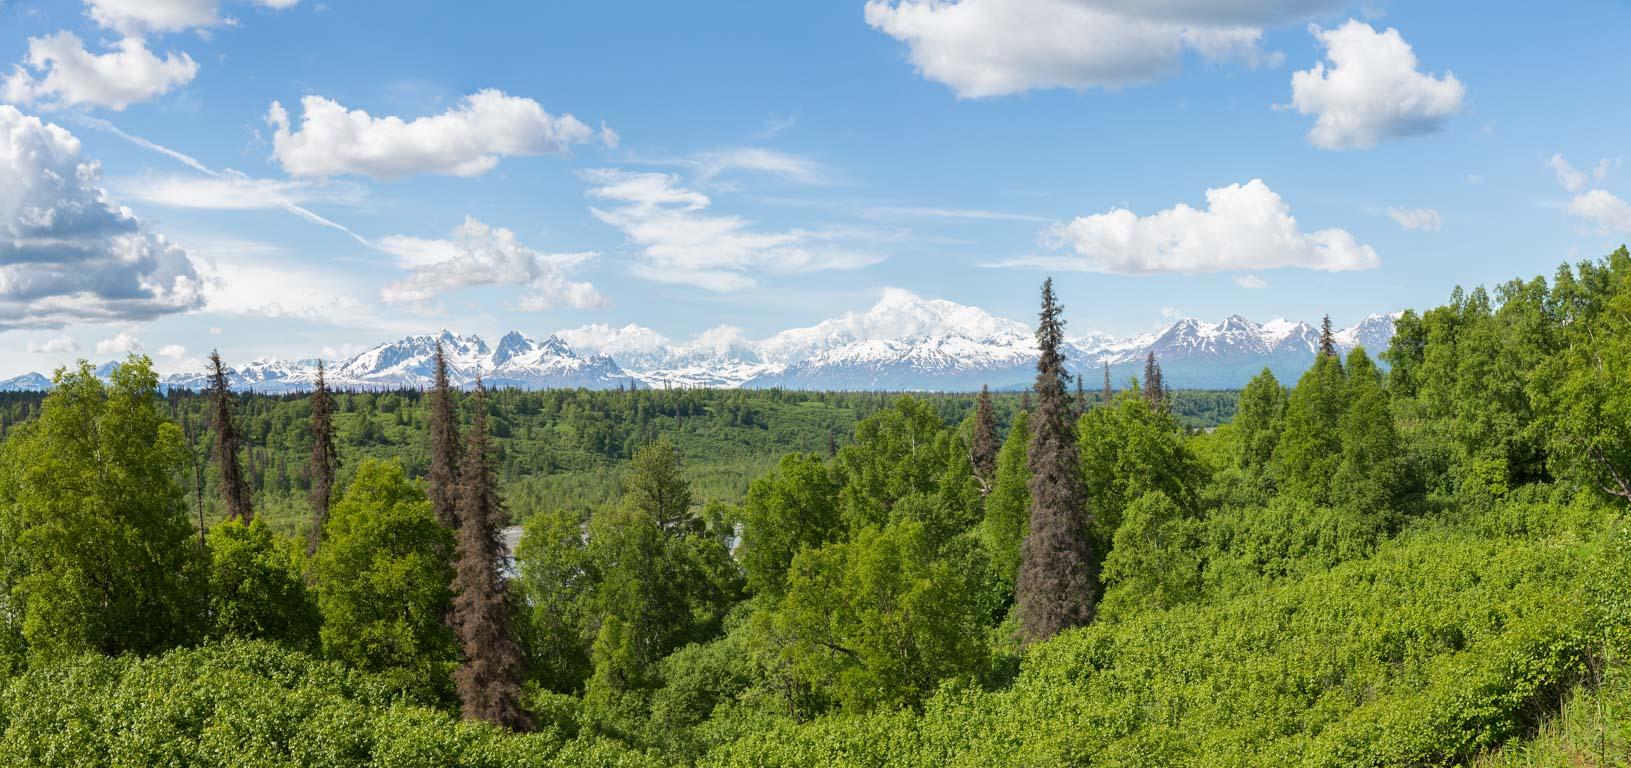 Denali South Viewpoint